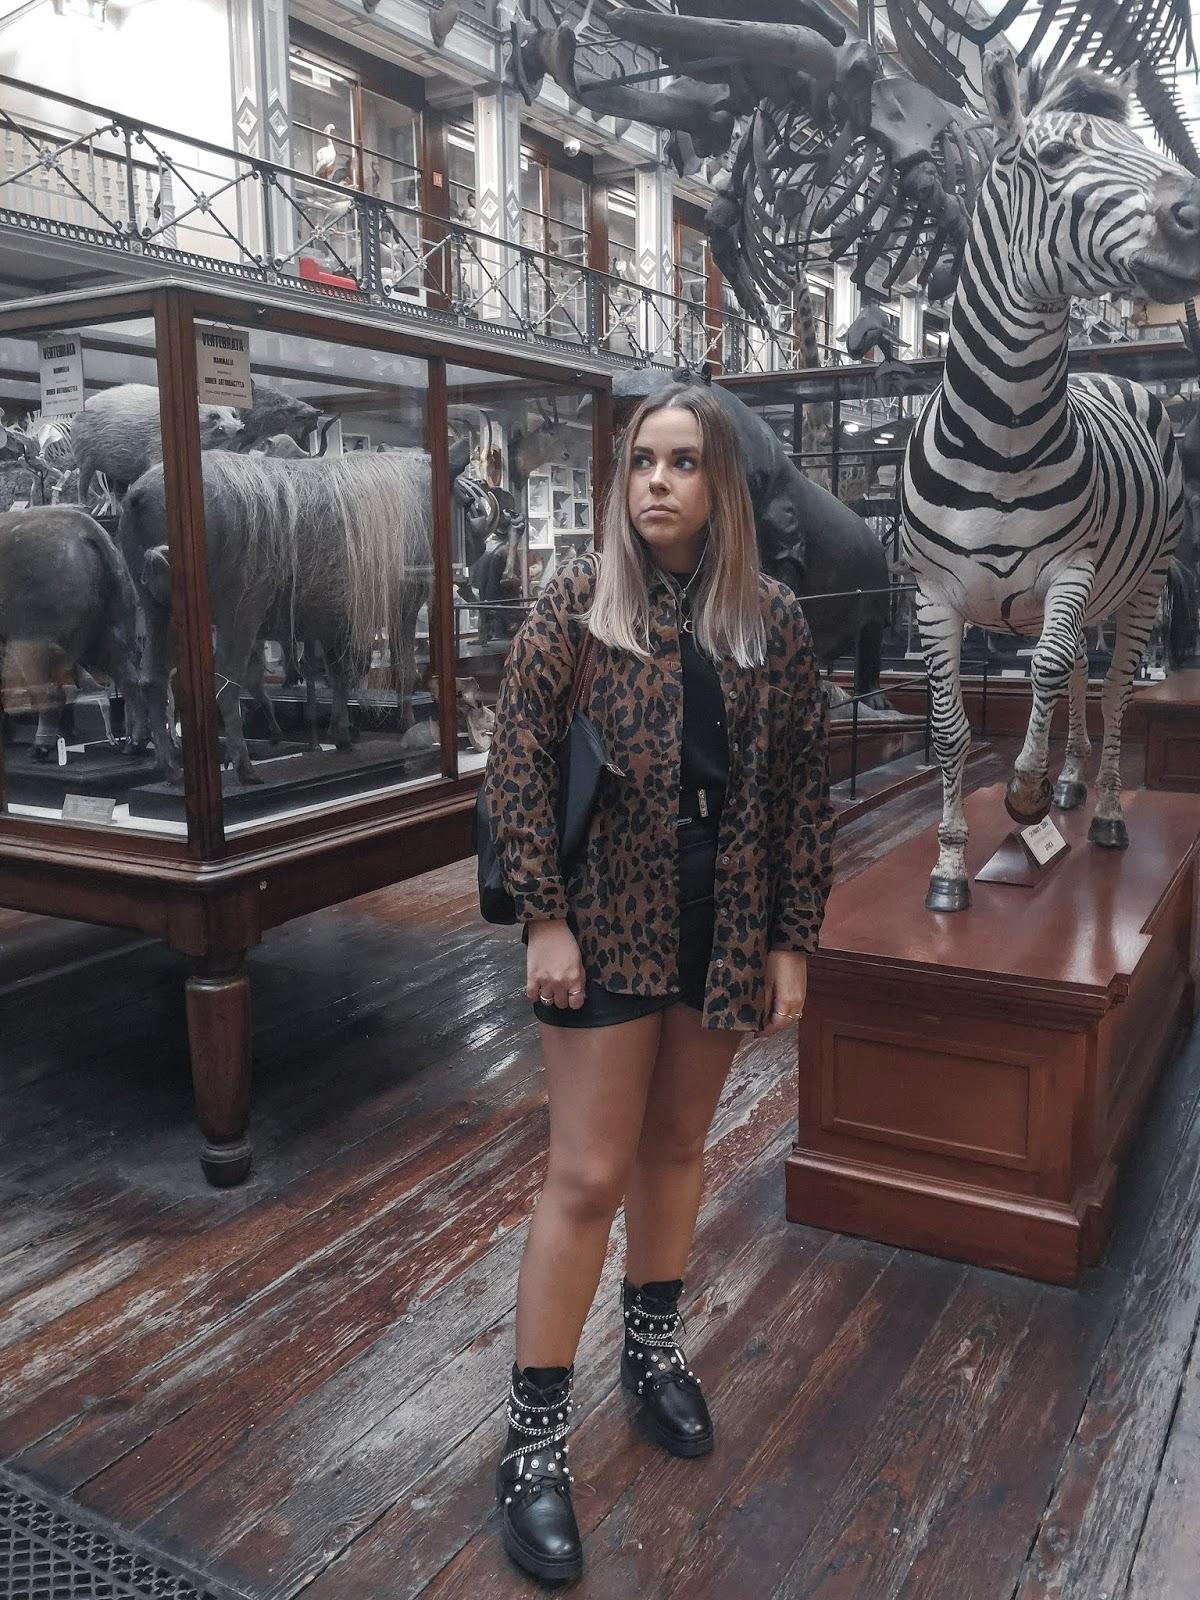 Museo de Historia Natural Dublin